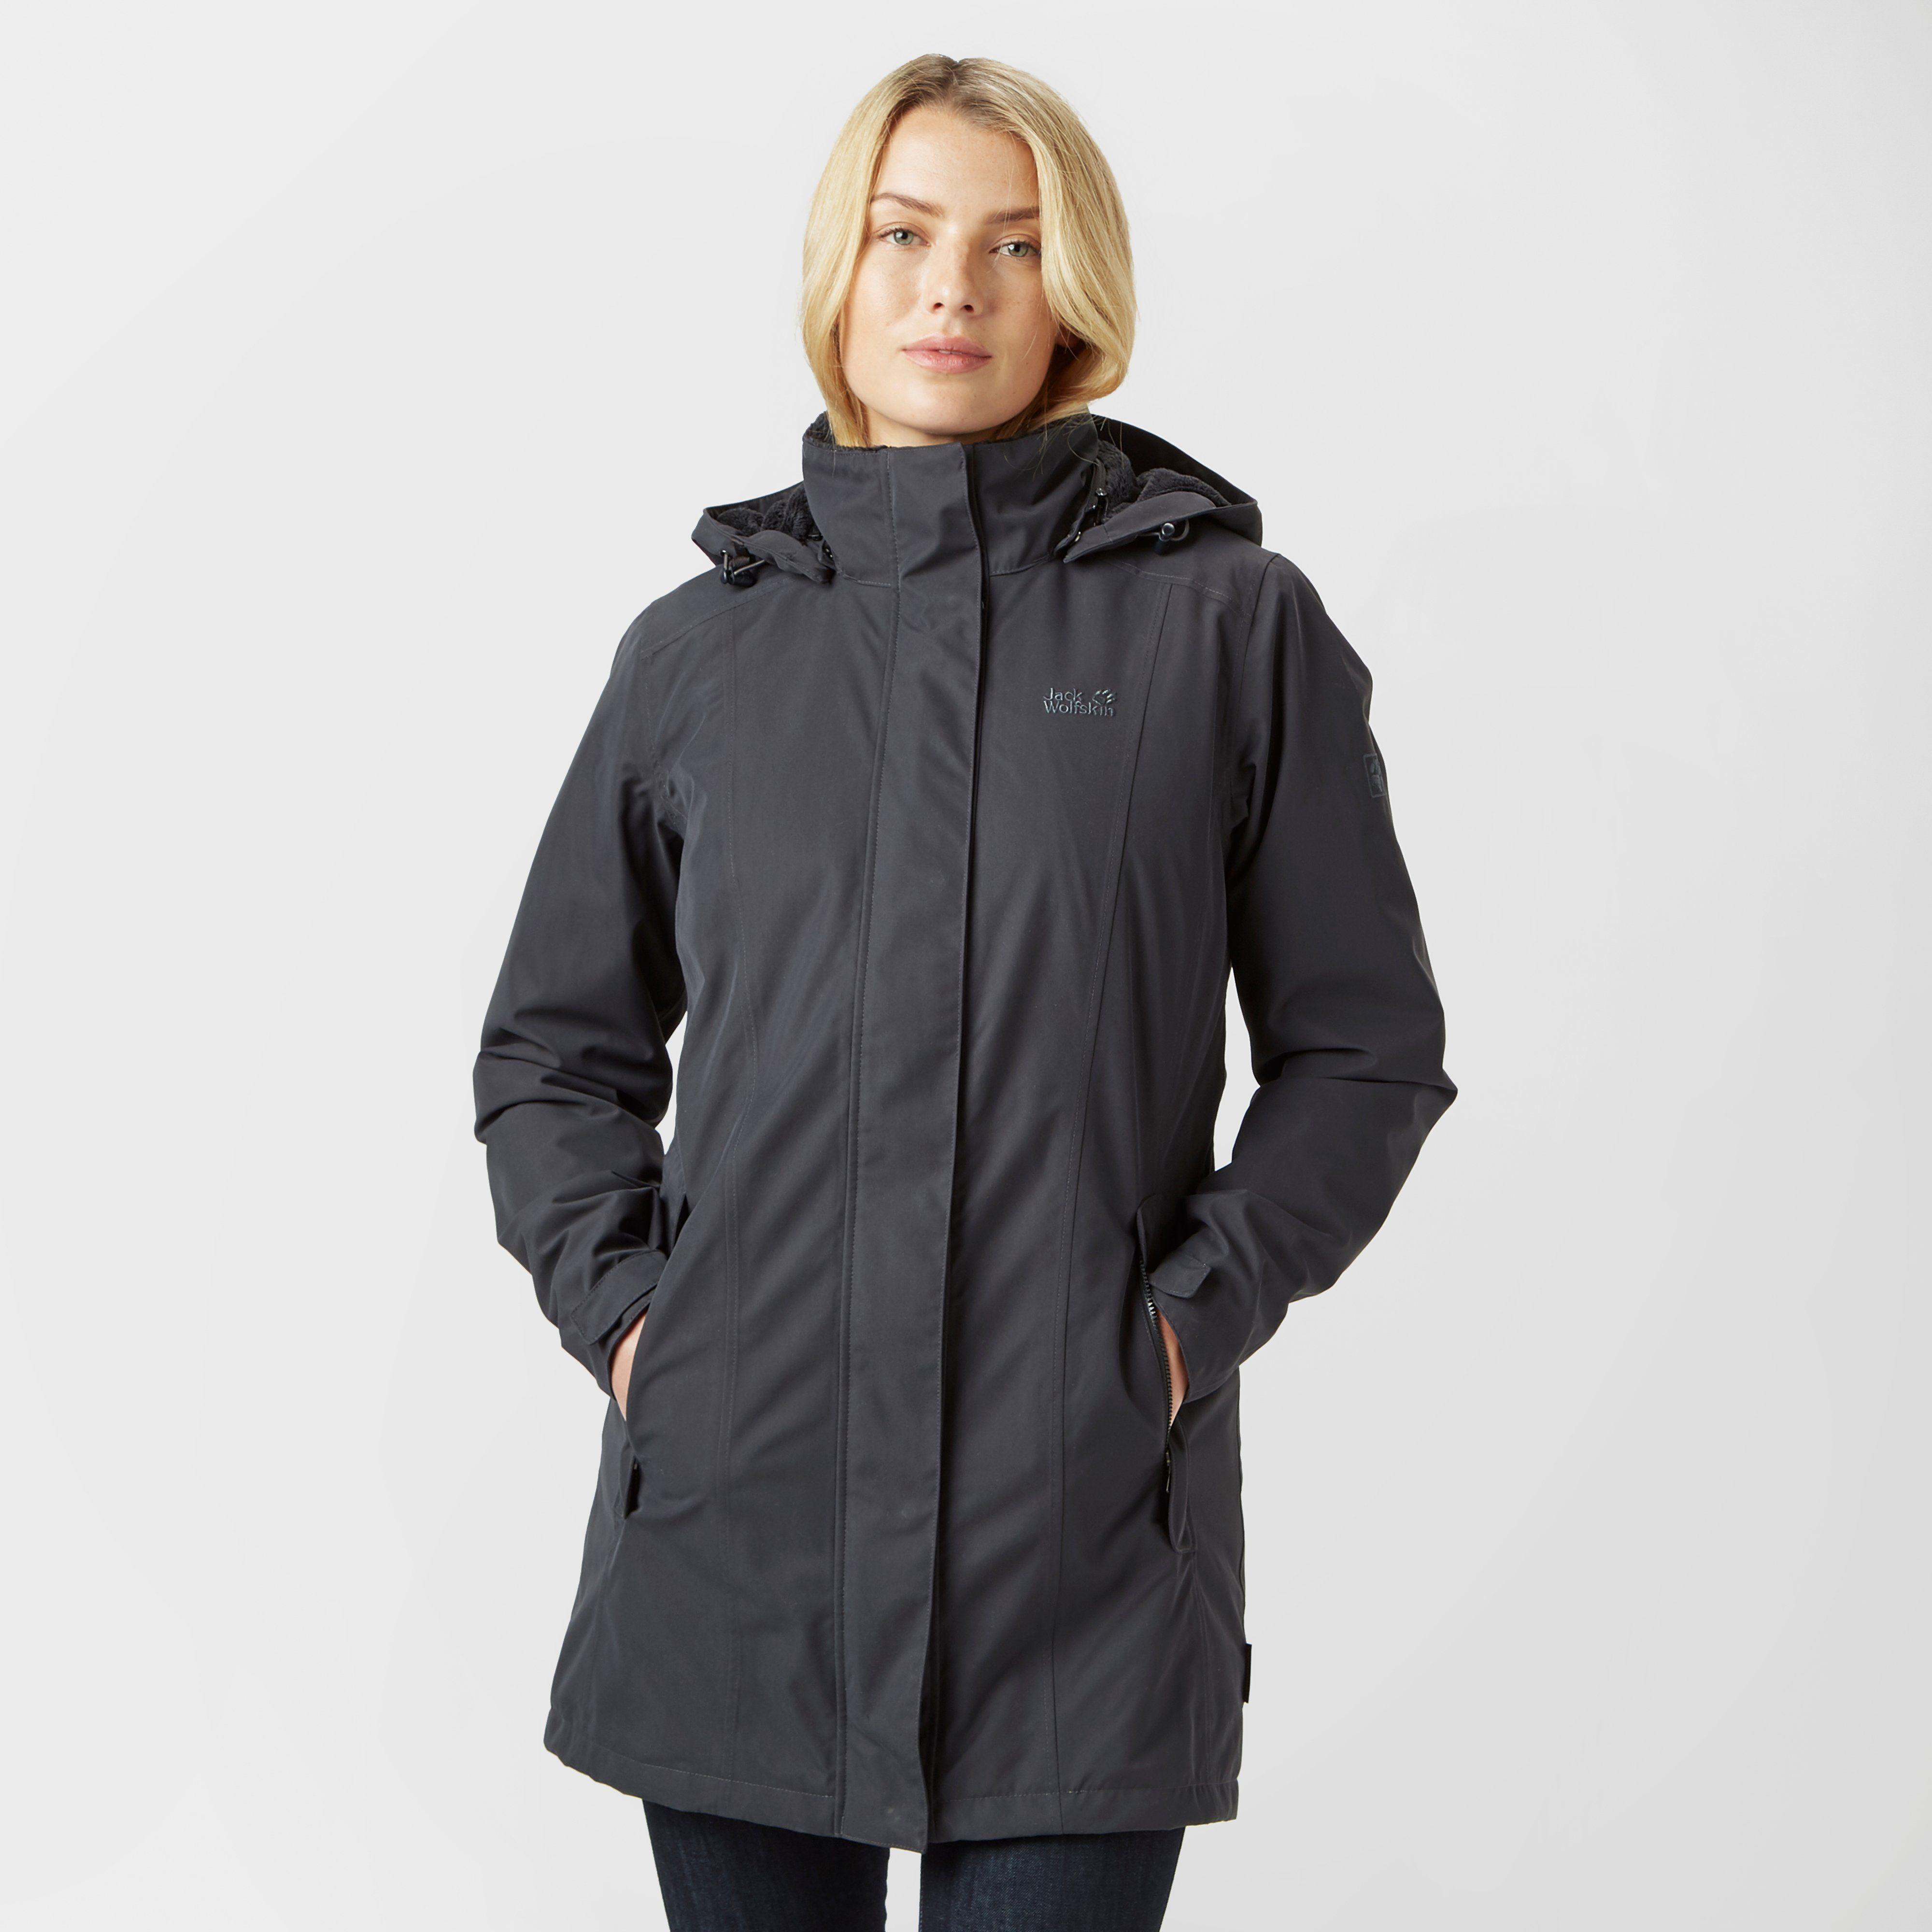 JACK WOLFSKIN Women's Madison Avenue Jacket